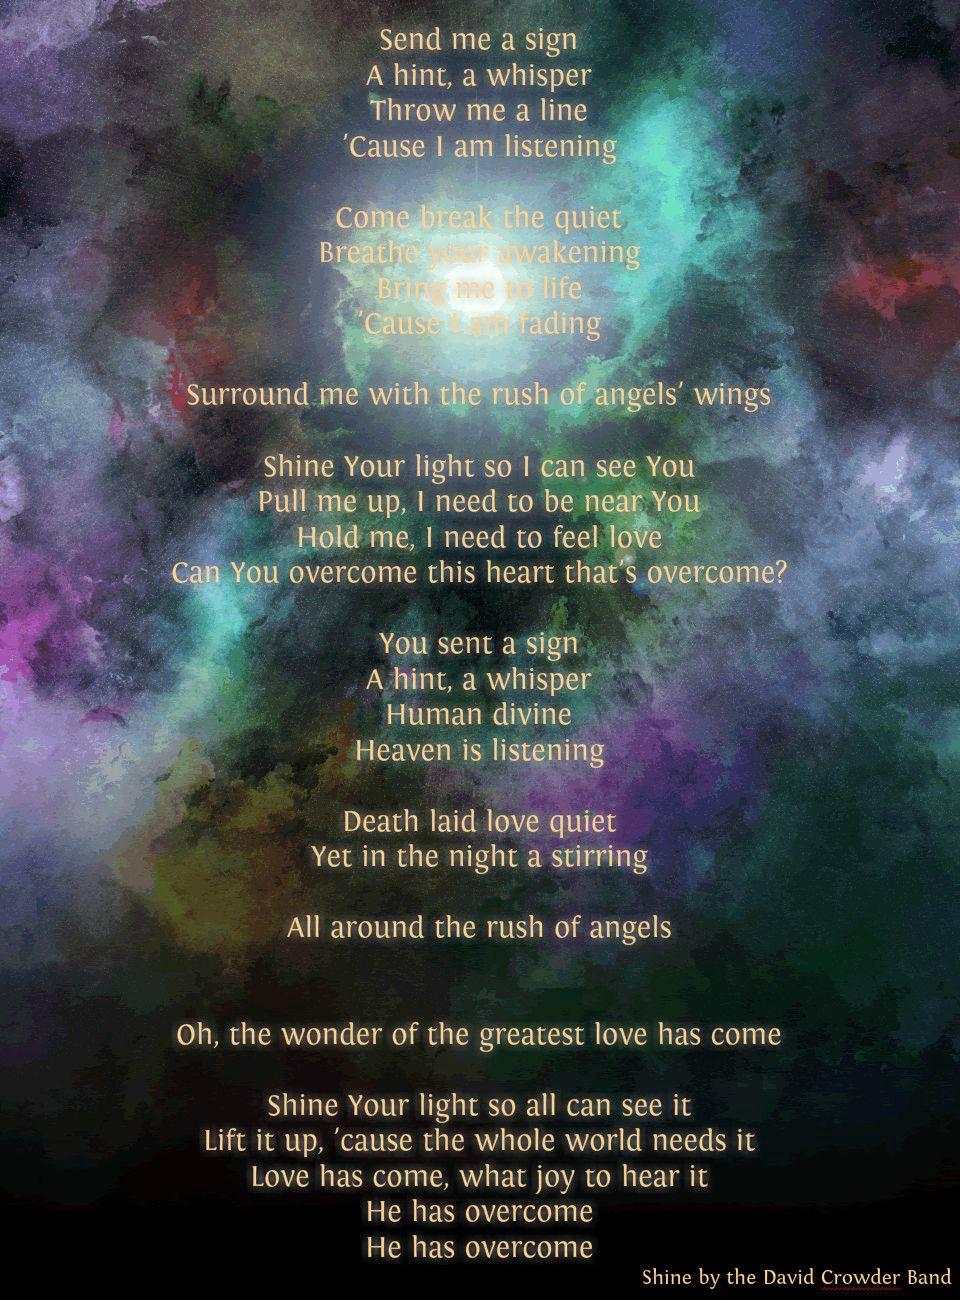 Shine - David Crowder Band. 'Through me a line cause I'm listening'